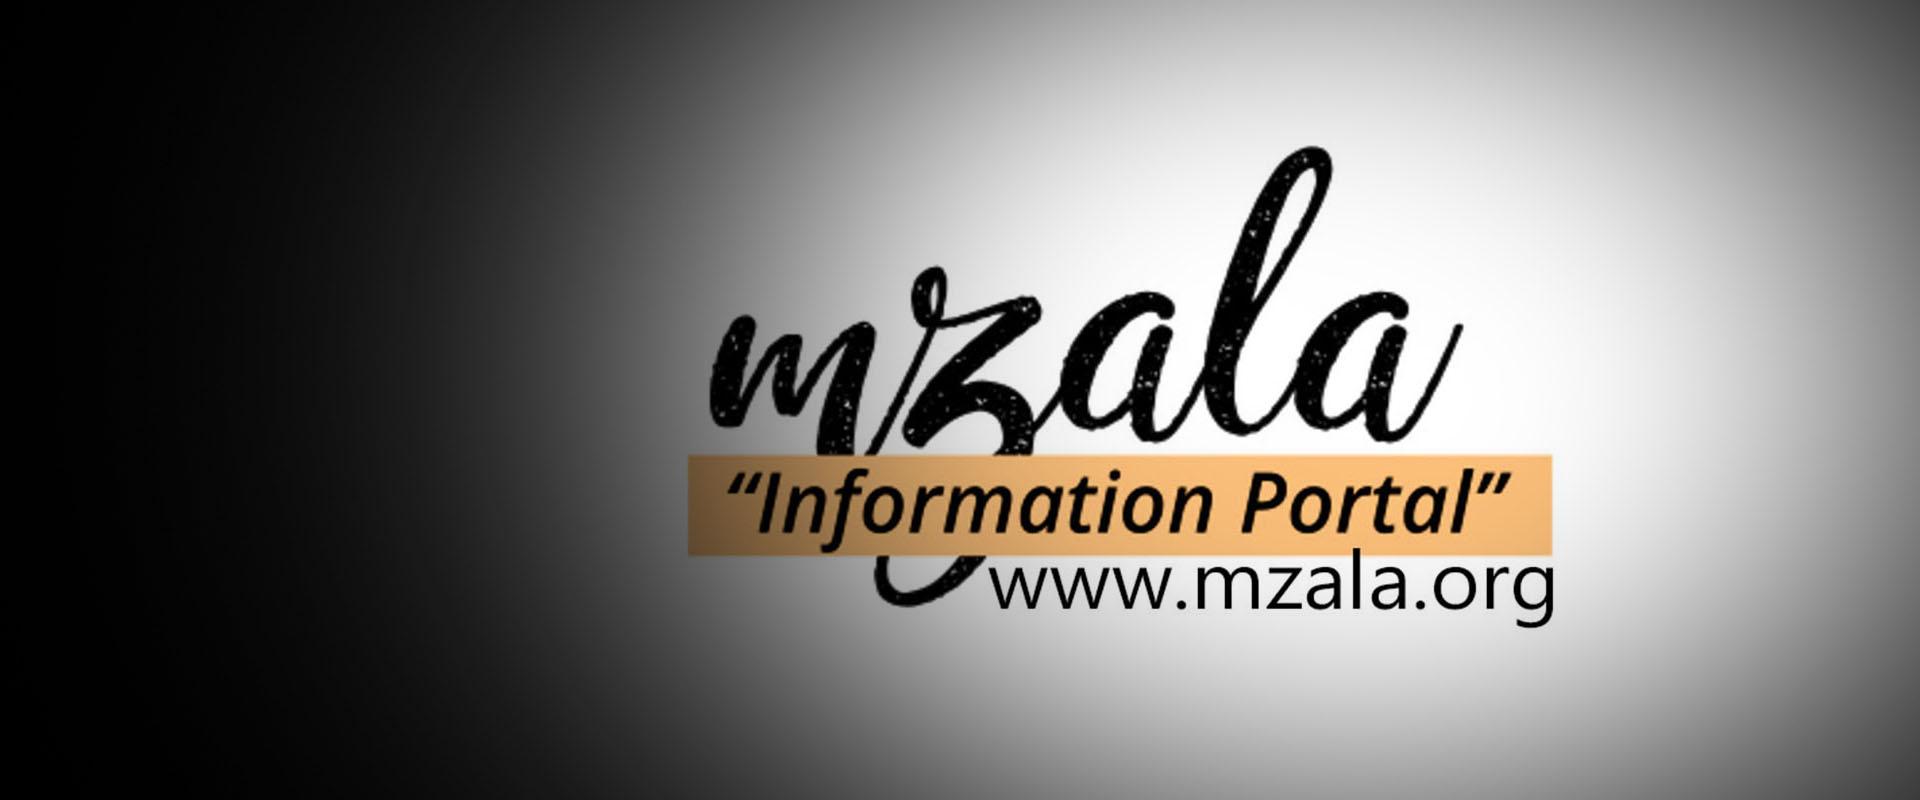 Mzala Information Portal - Intellectual Fountations